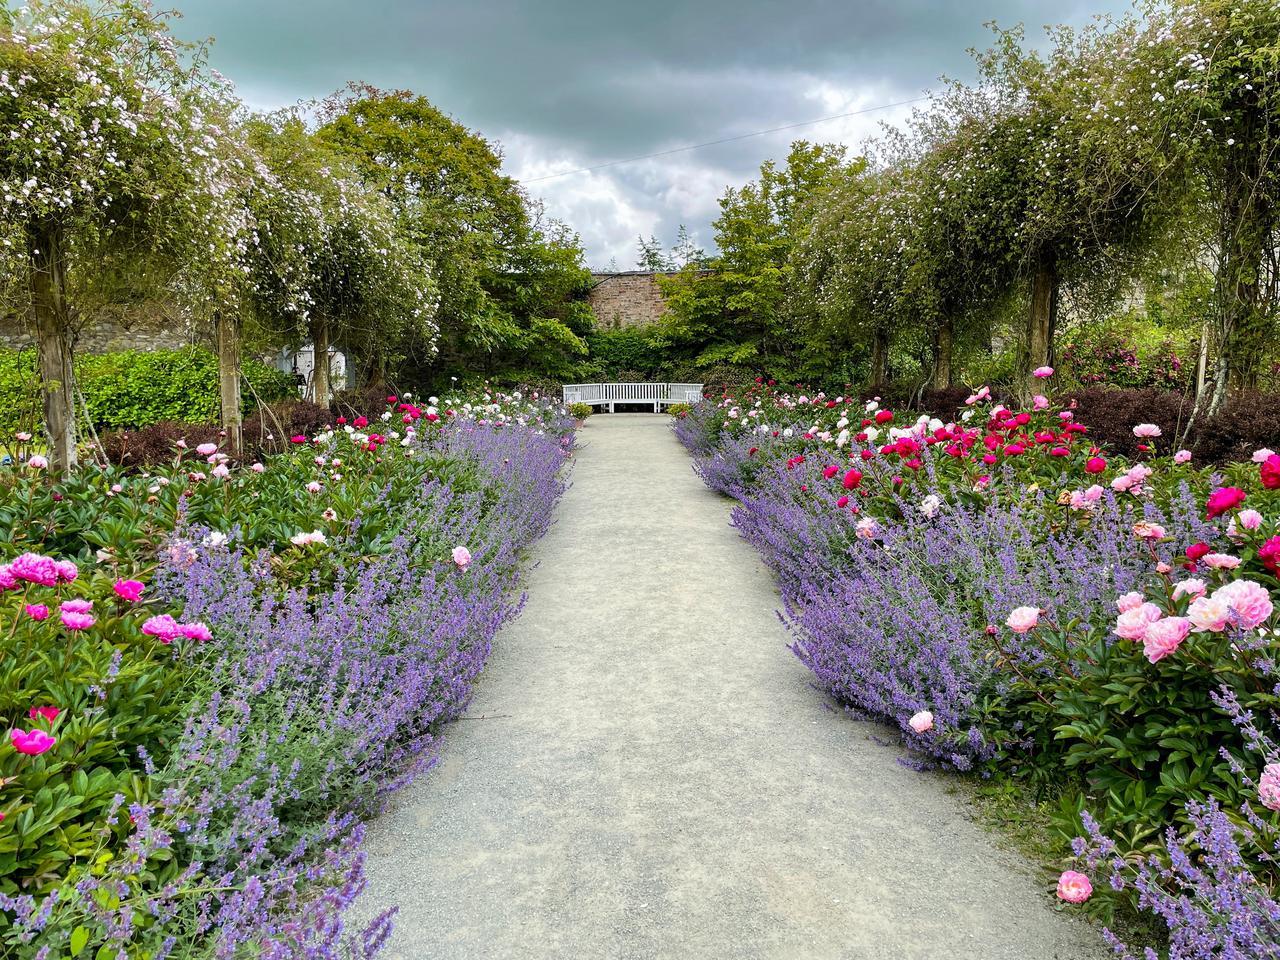 Plant community, Flower, Cloud, Sky, Tree, Petal, Vegetation, Hedge, Grass